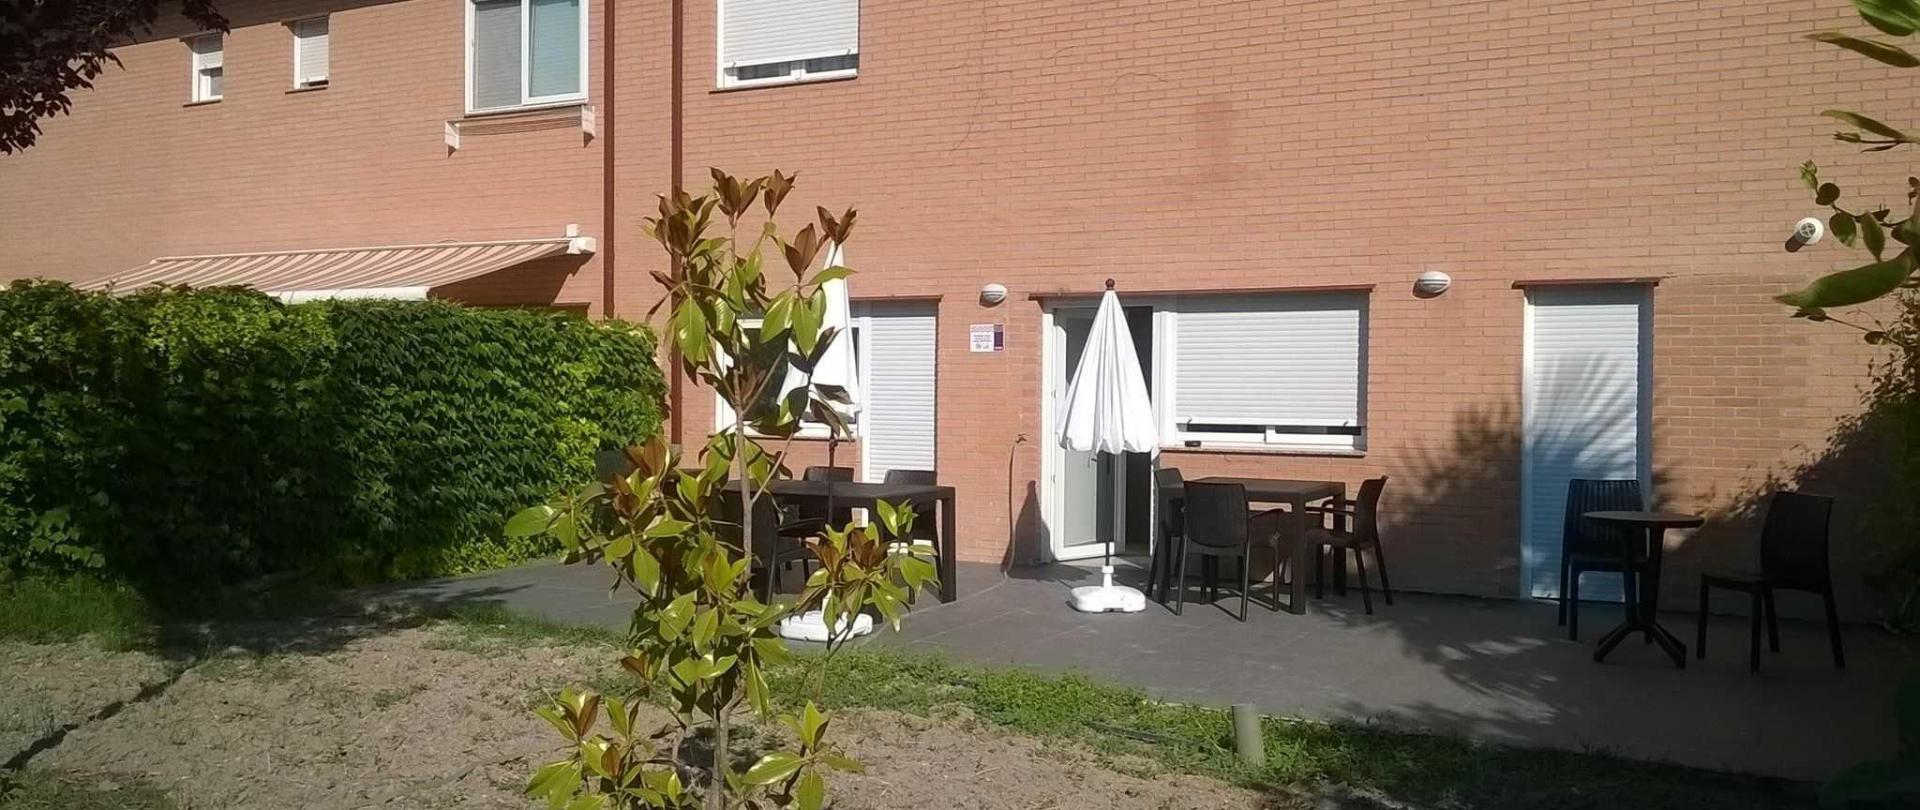 utf-8-terraza-p-blica-3.jpg